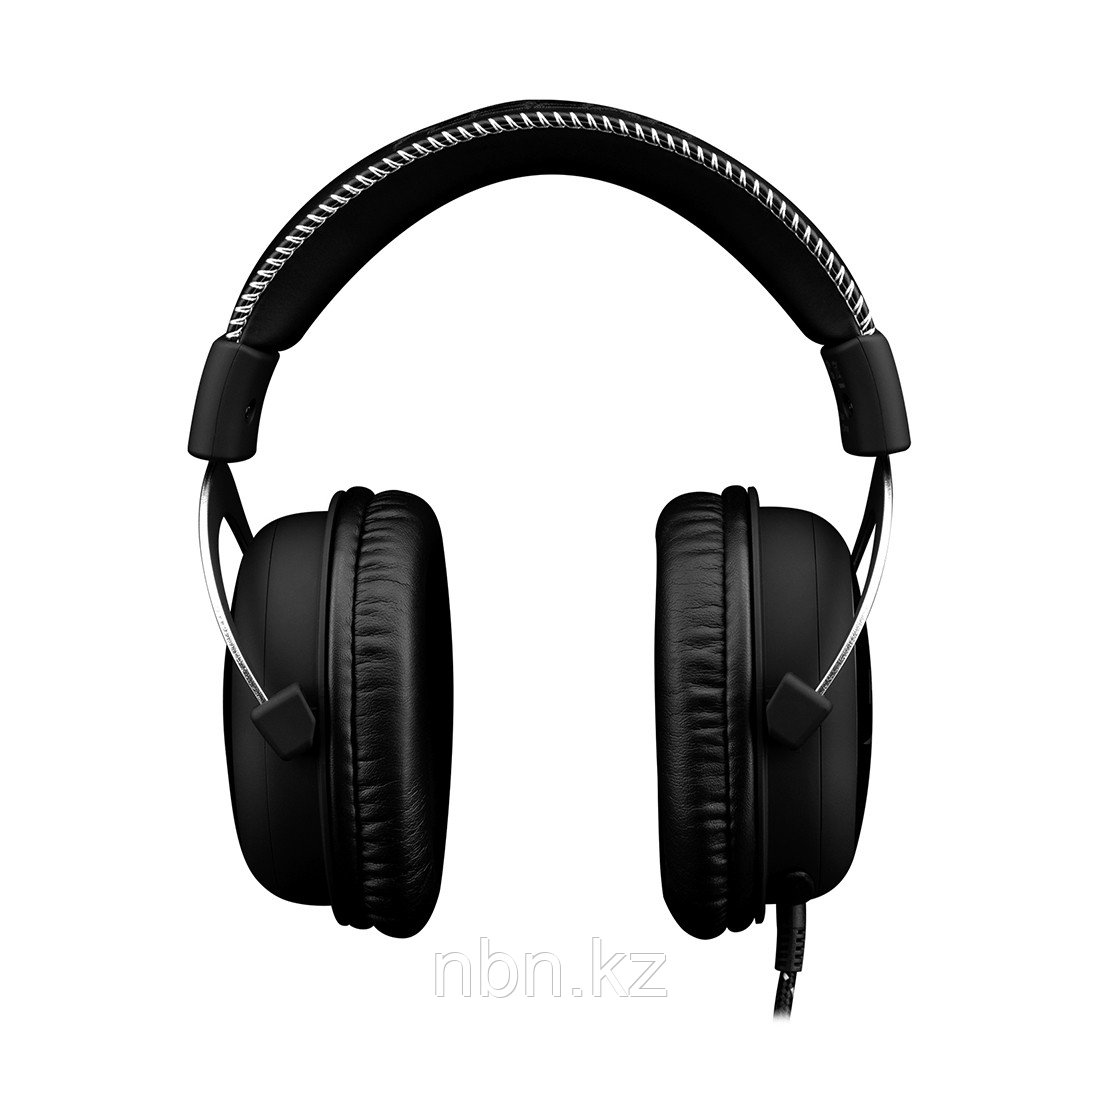 Наушники HyperX Cloud Gaming Headset - Silver HX-HSCL-SR/NA